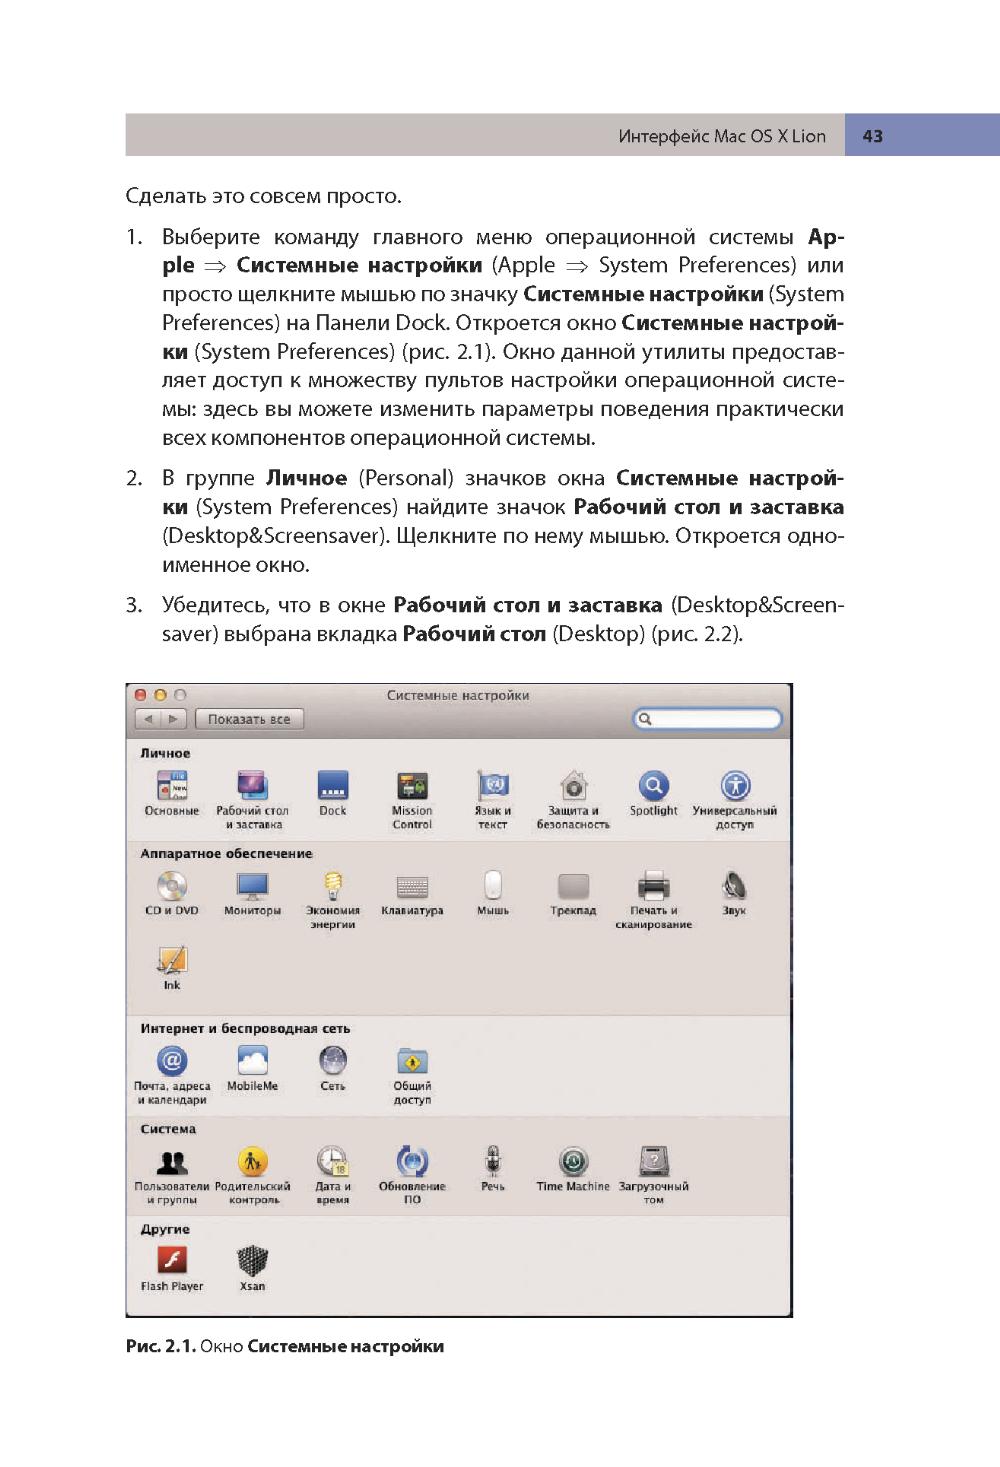 http://i1.imageban.ru/out/2013/12/13/b52875d0302de840b23d4106c51838df.jpg